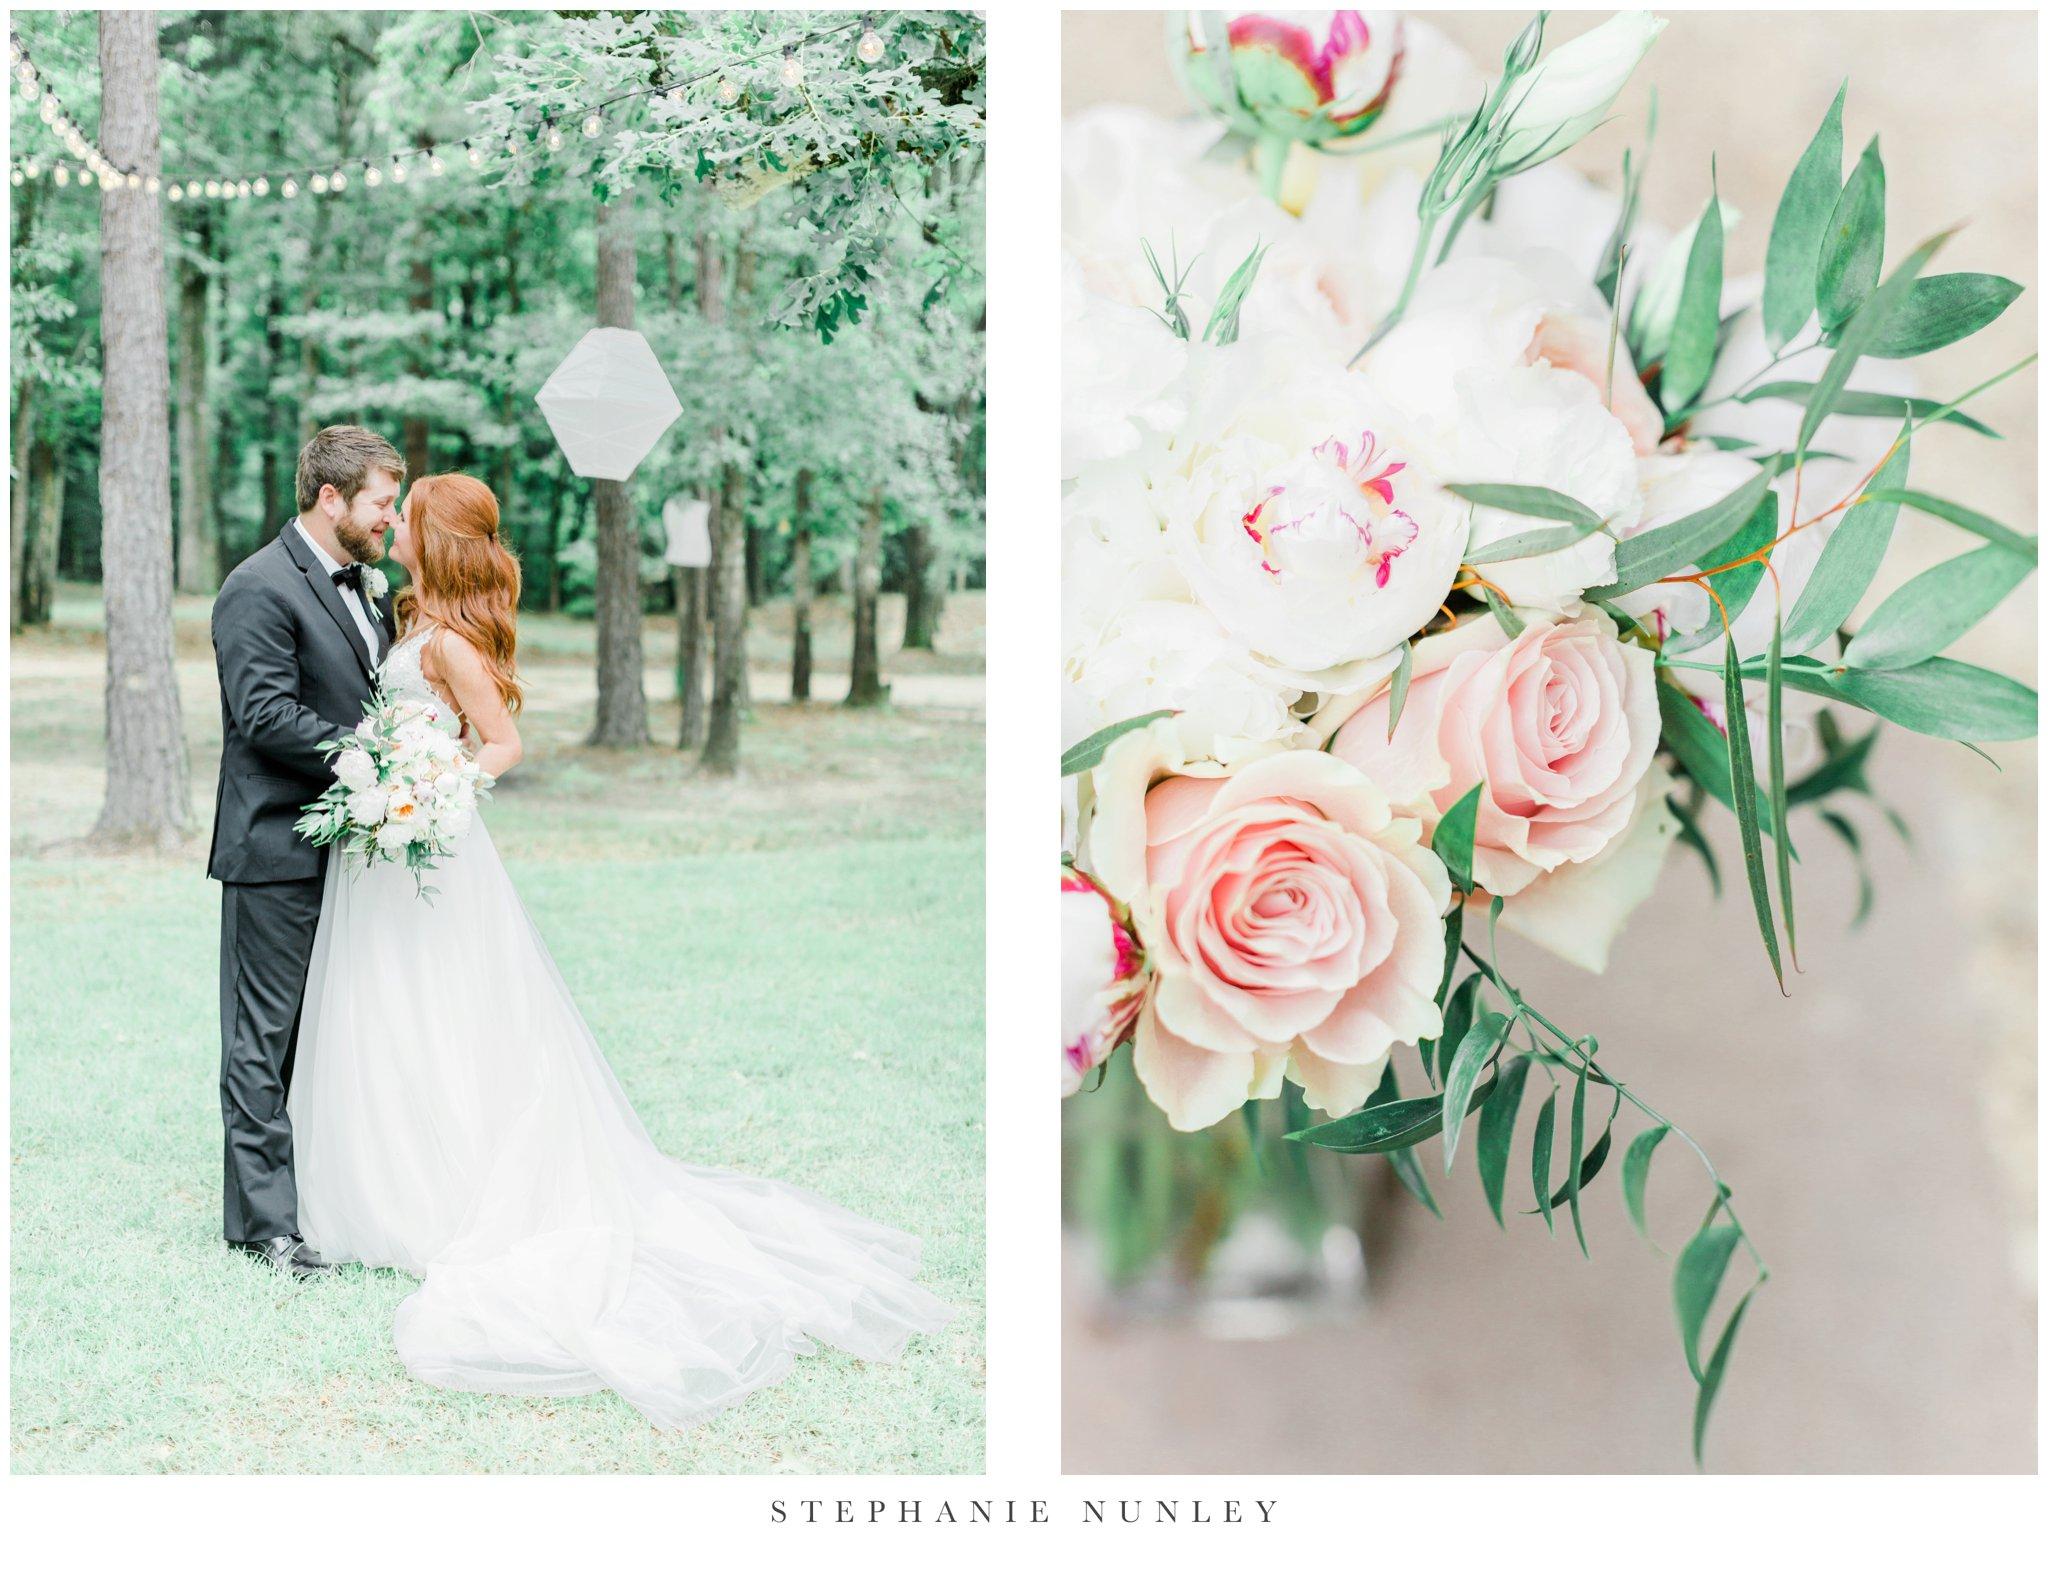 blessing-tree-farm-arkansas-wedding-0037.jpg